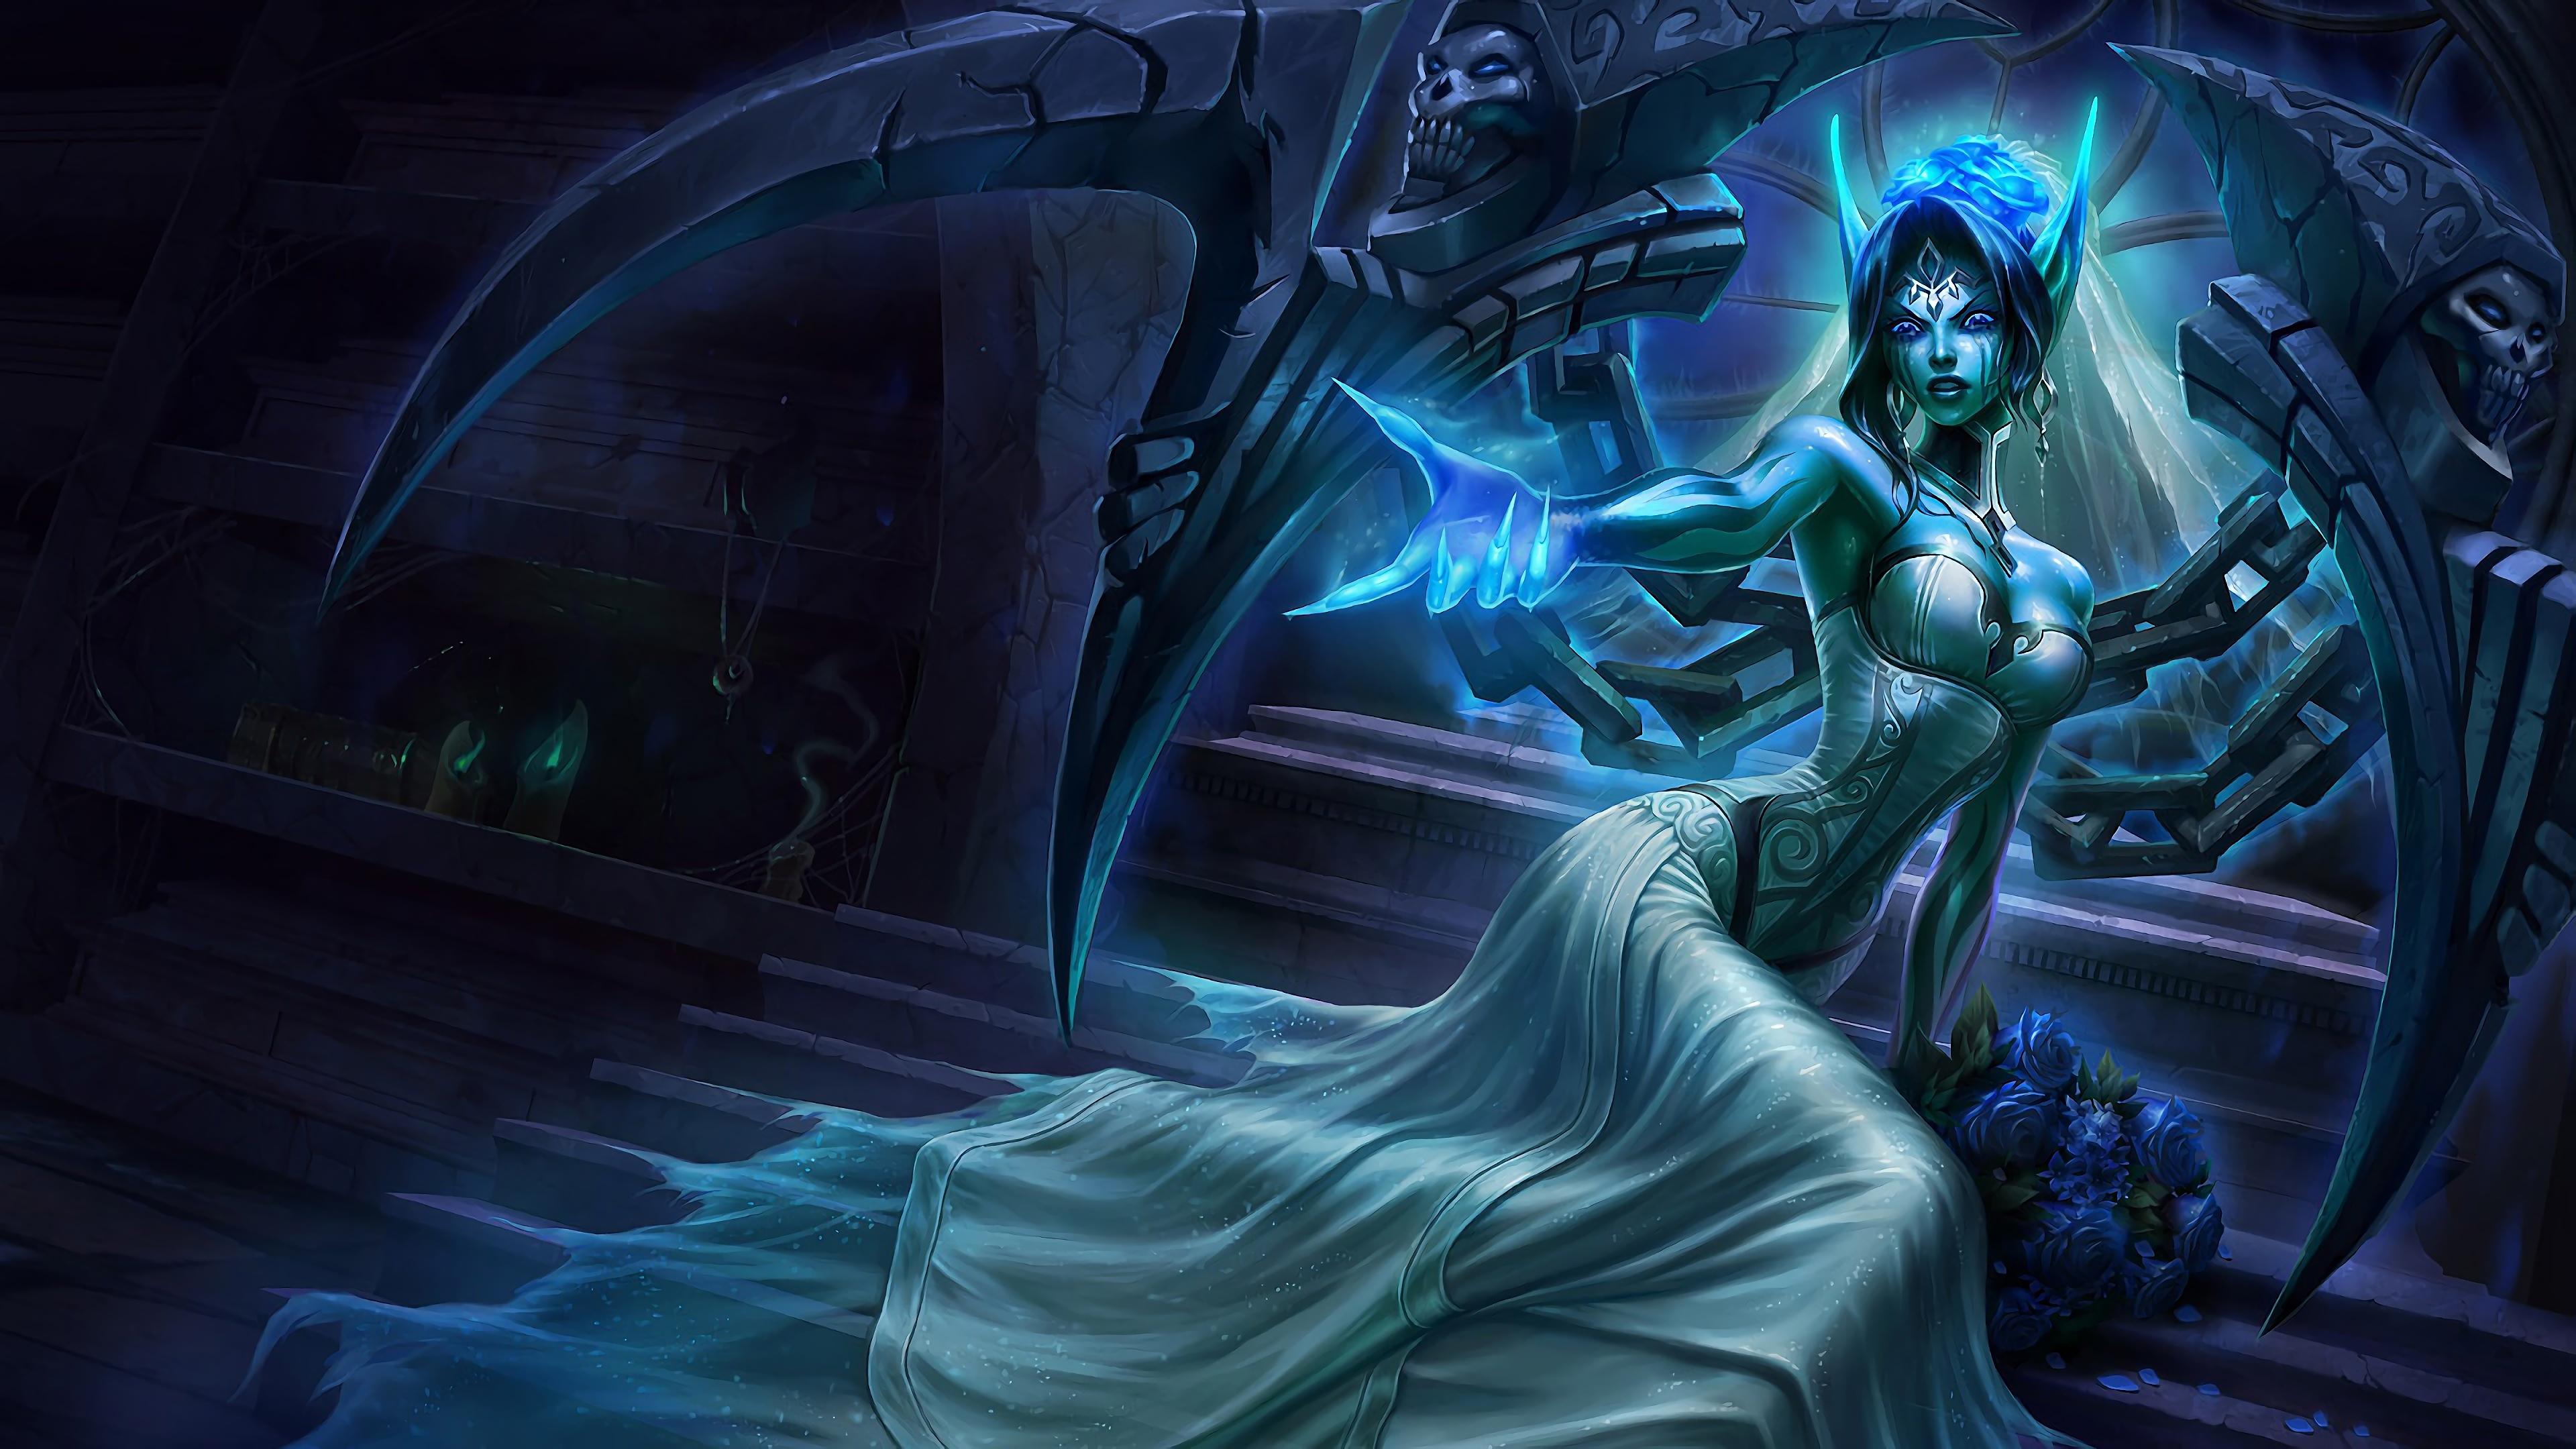 ghost bride morgana lol splash art league of legends 1574098200 - Ghost Bride Morgana LoL Splash Art League of Legends - Morgana, league of legends